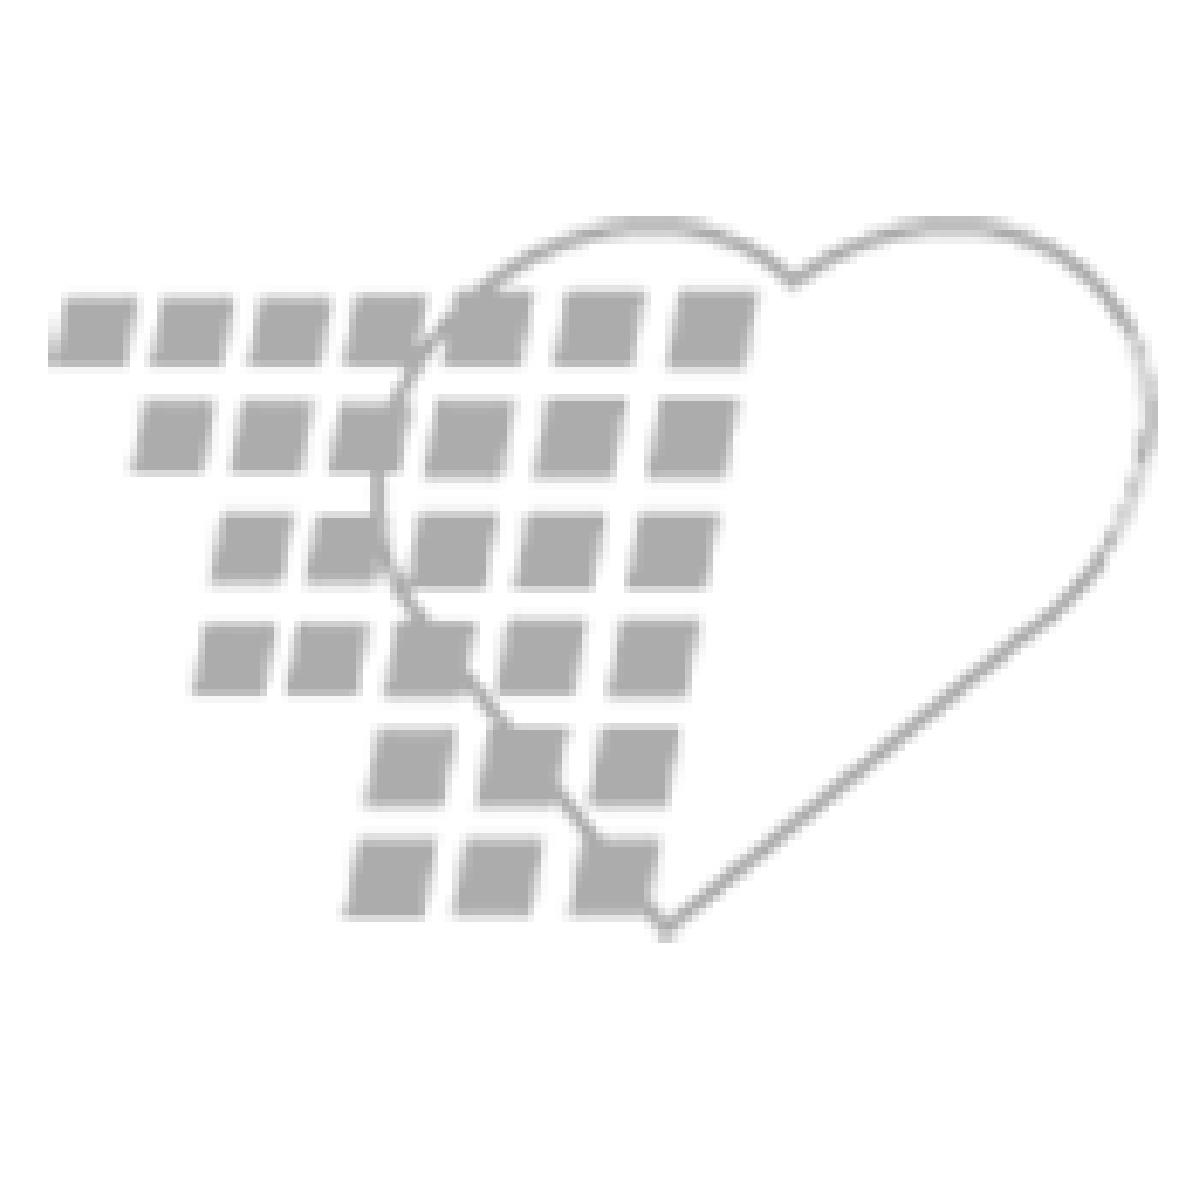 06-93-0415 Demo Dose ® Potassim Phosphats 3 mM P/mL and 4.4 mEq K+/mL, 15mL